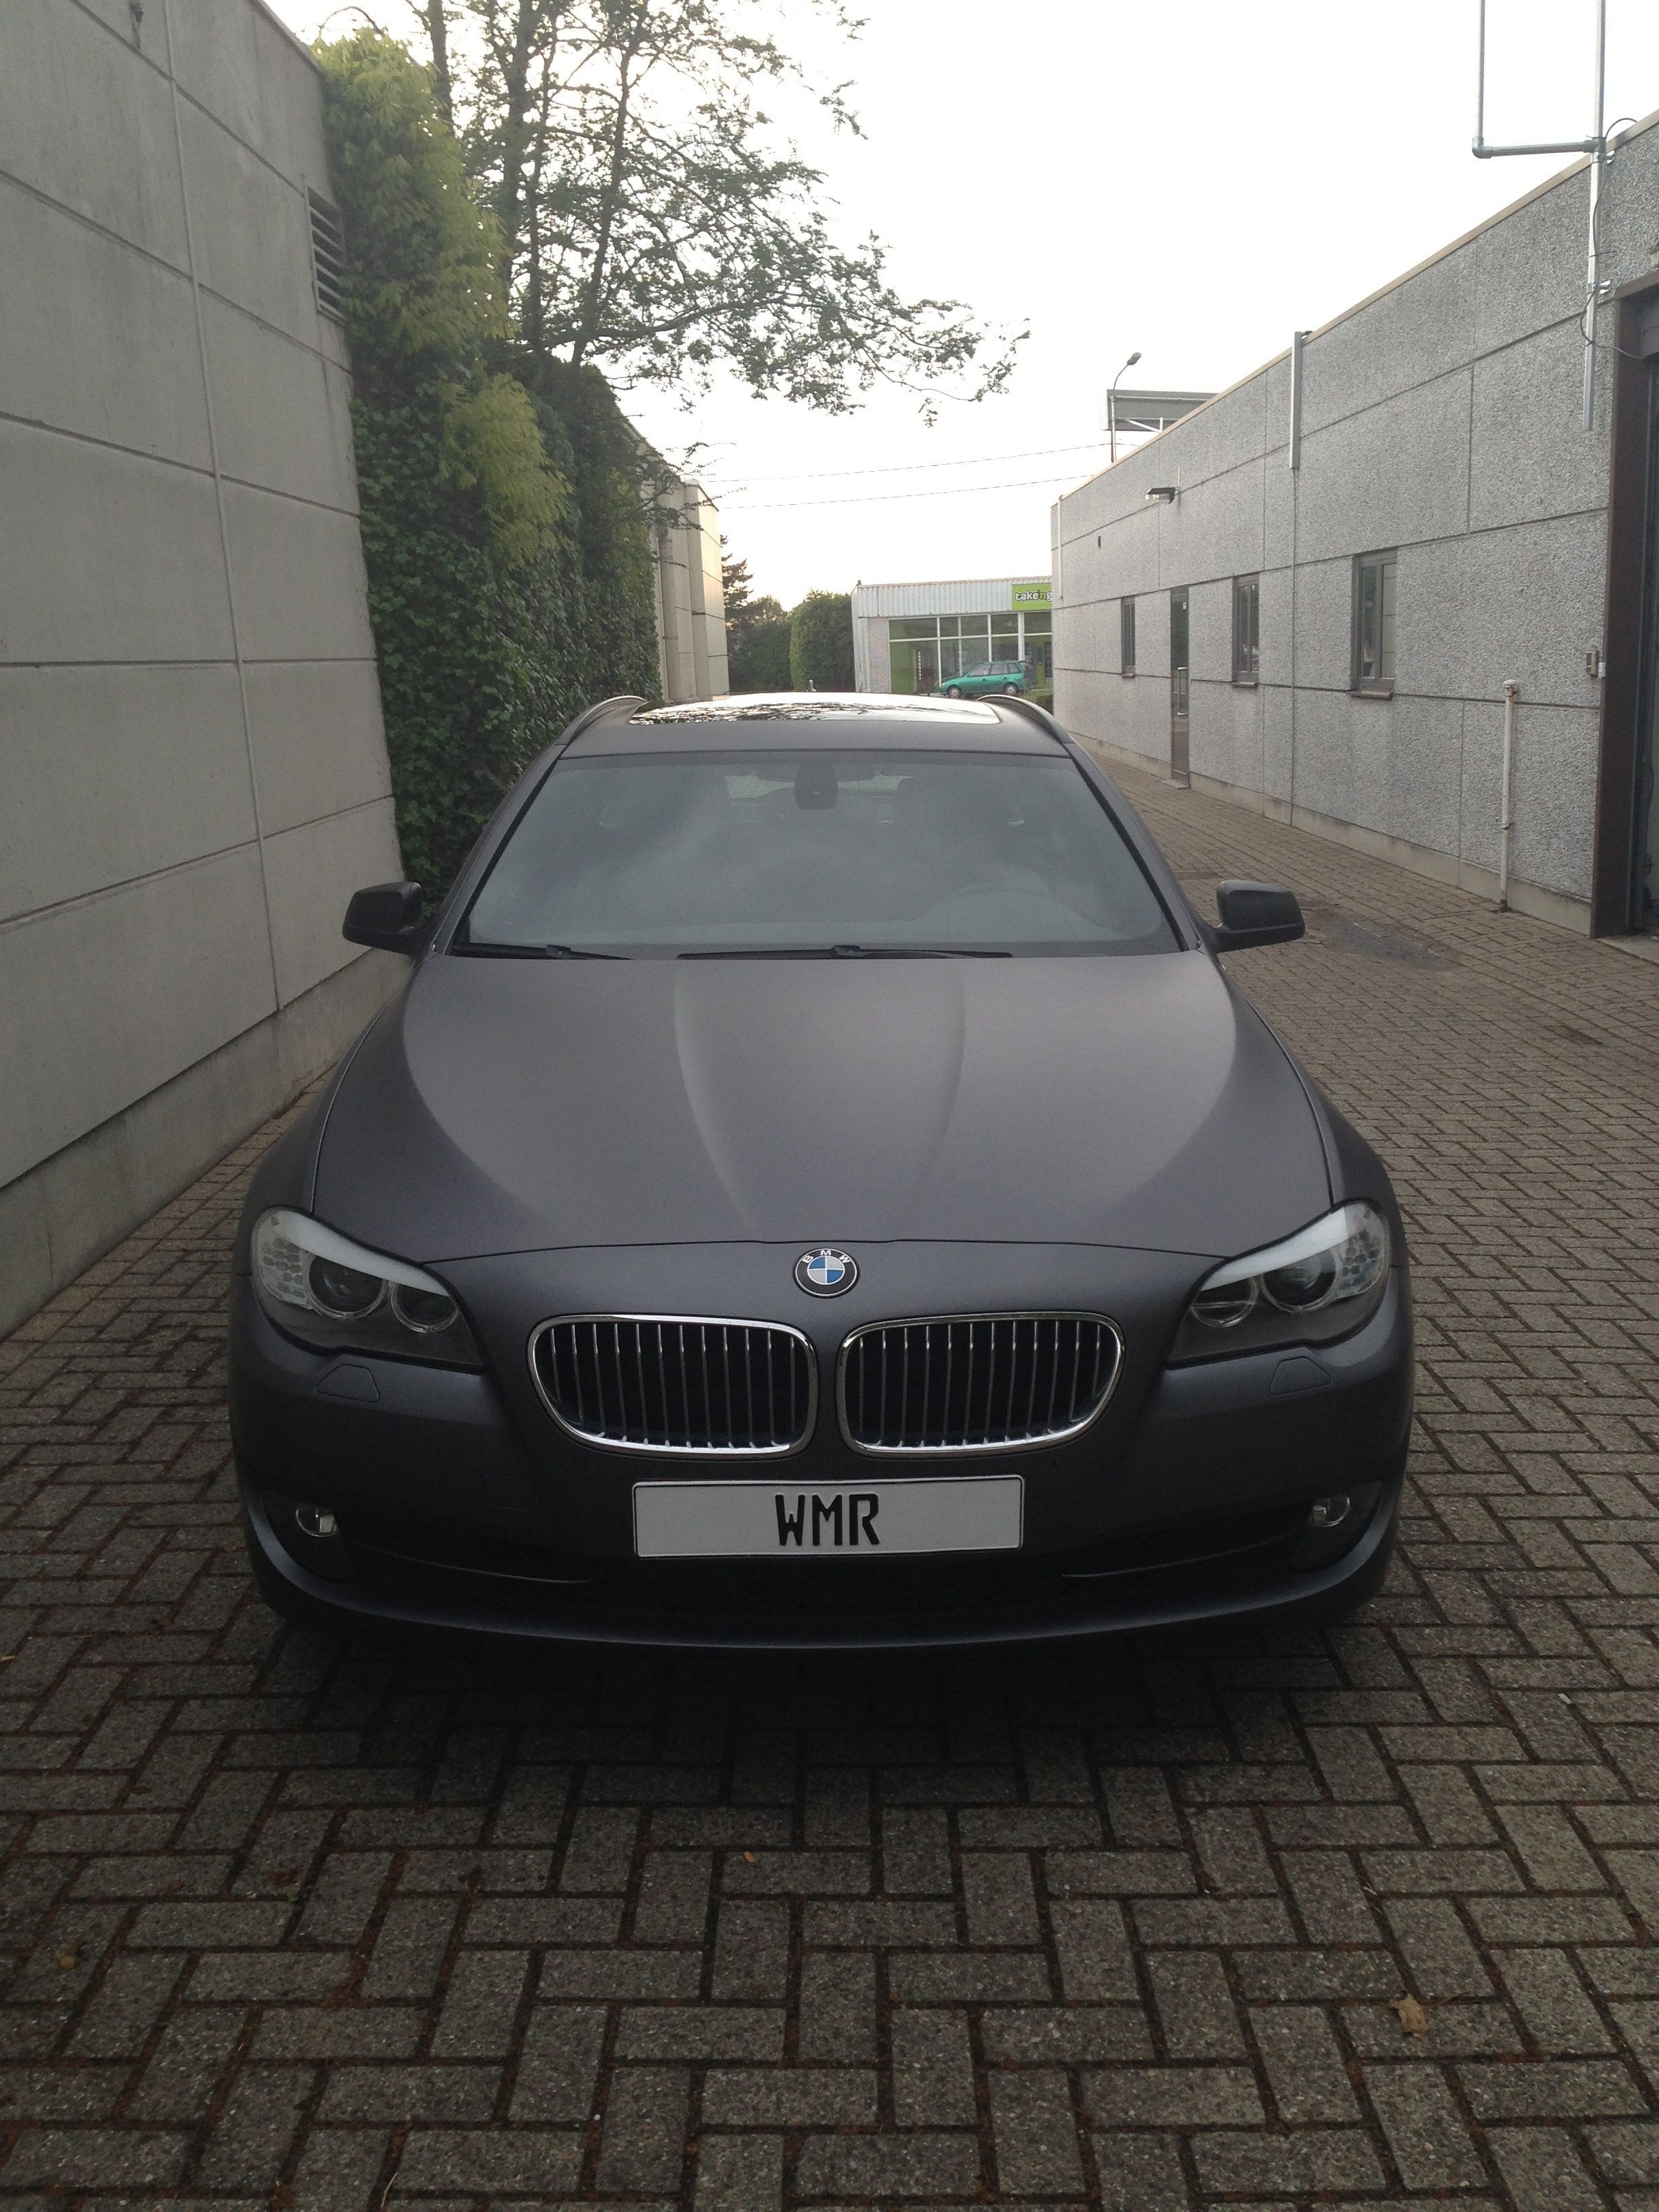 BMW 5 Serie met Gunpowder Wrap, Carwrapping door Wrapmyride.nu Foto-nr:5265, ©2021